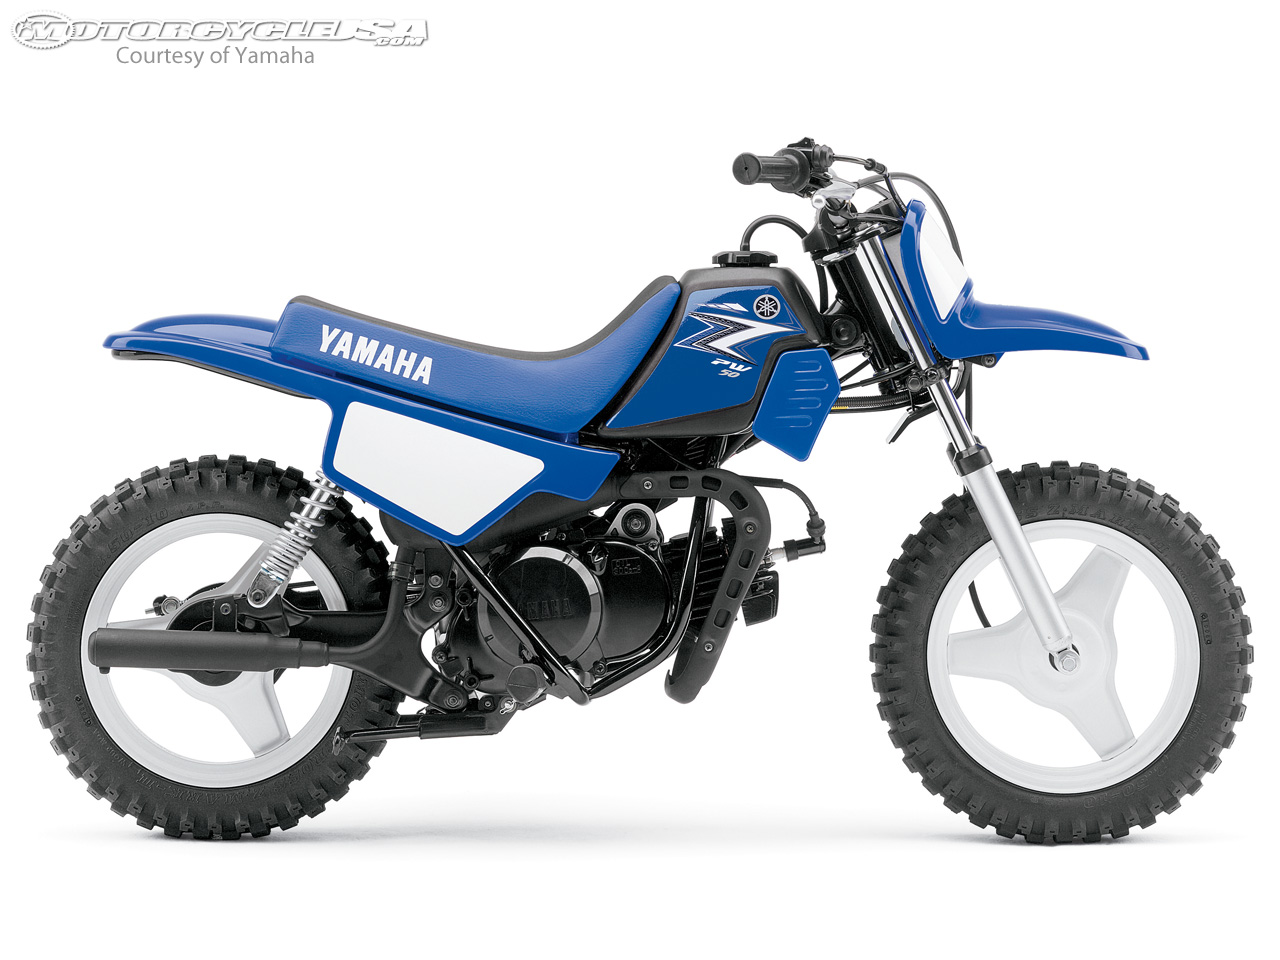 Yamaha clipart dirt bike USA Bike Photos 2012 Dirt